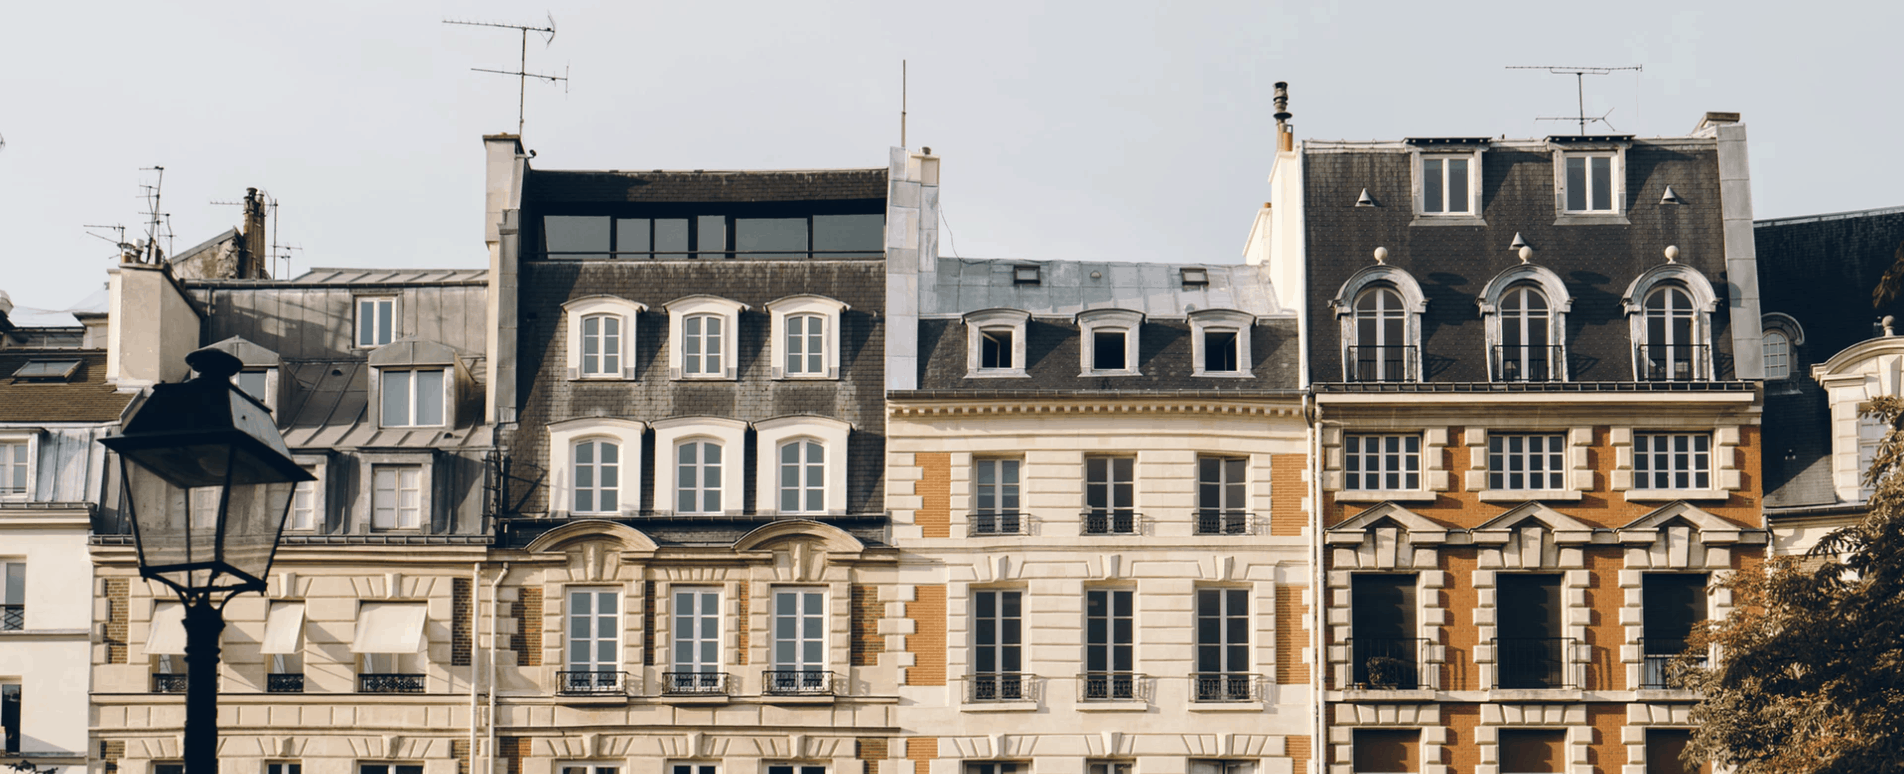 Datenbank Deutscher Investoren Wohnimmobilien